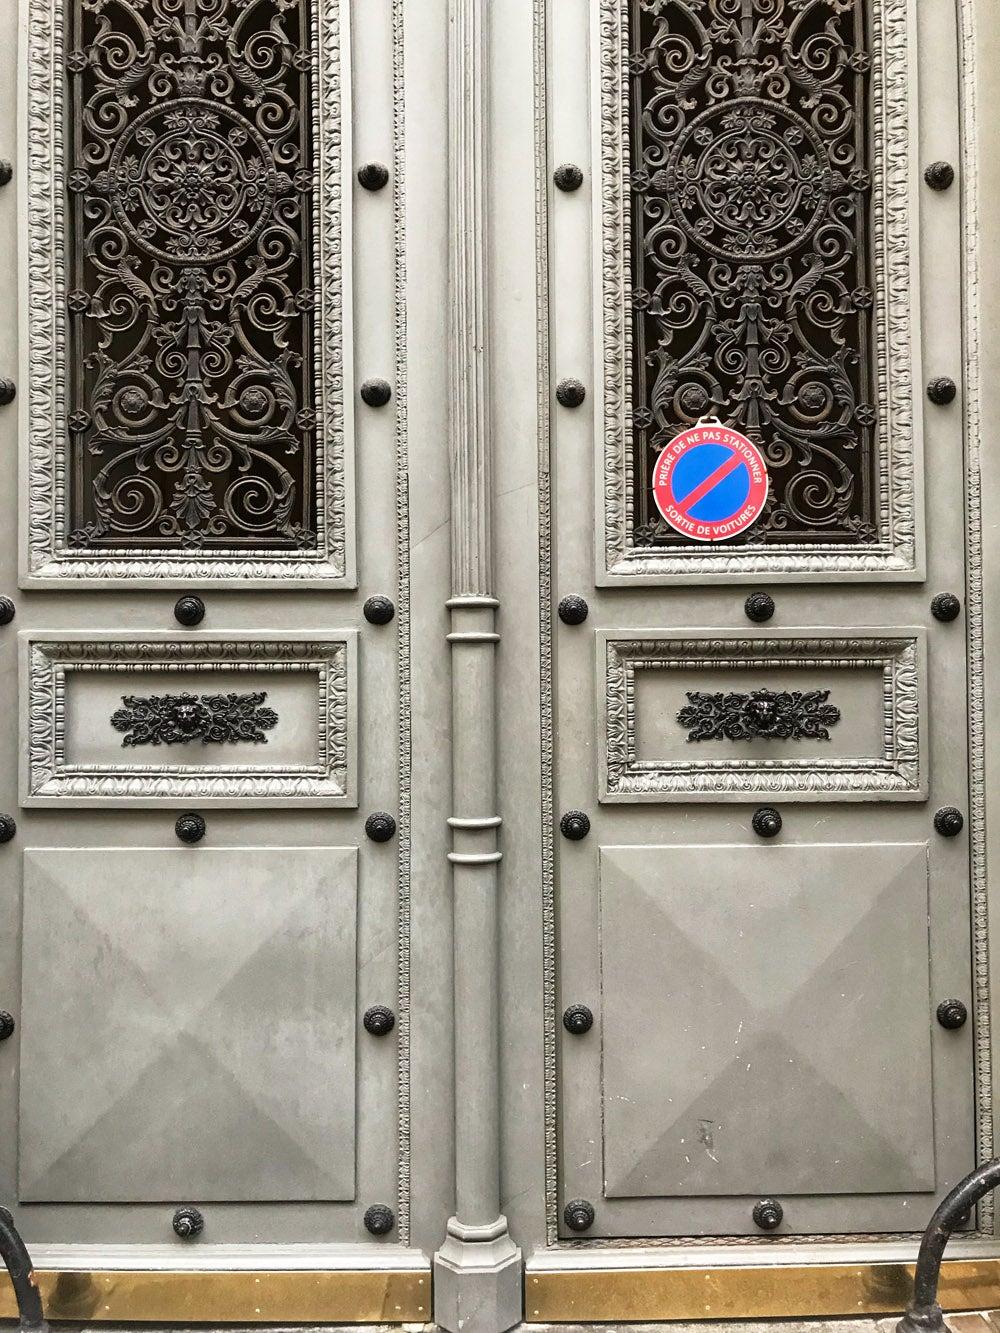 A closed doorway